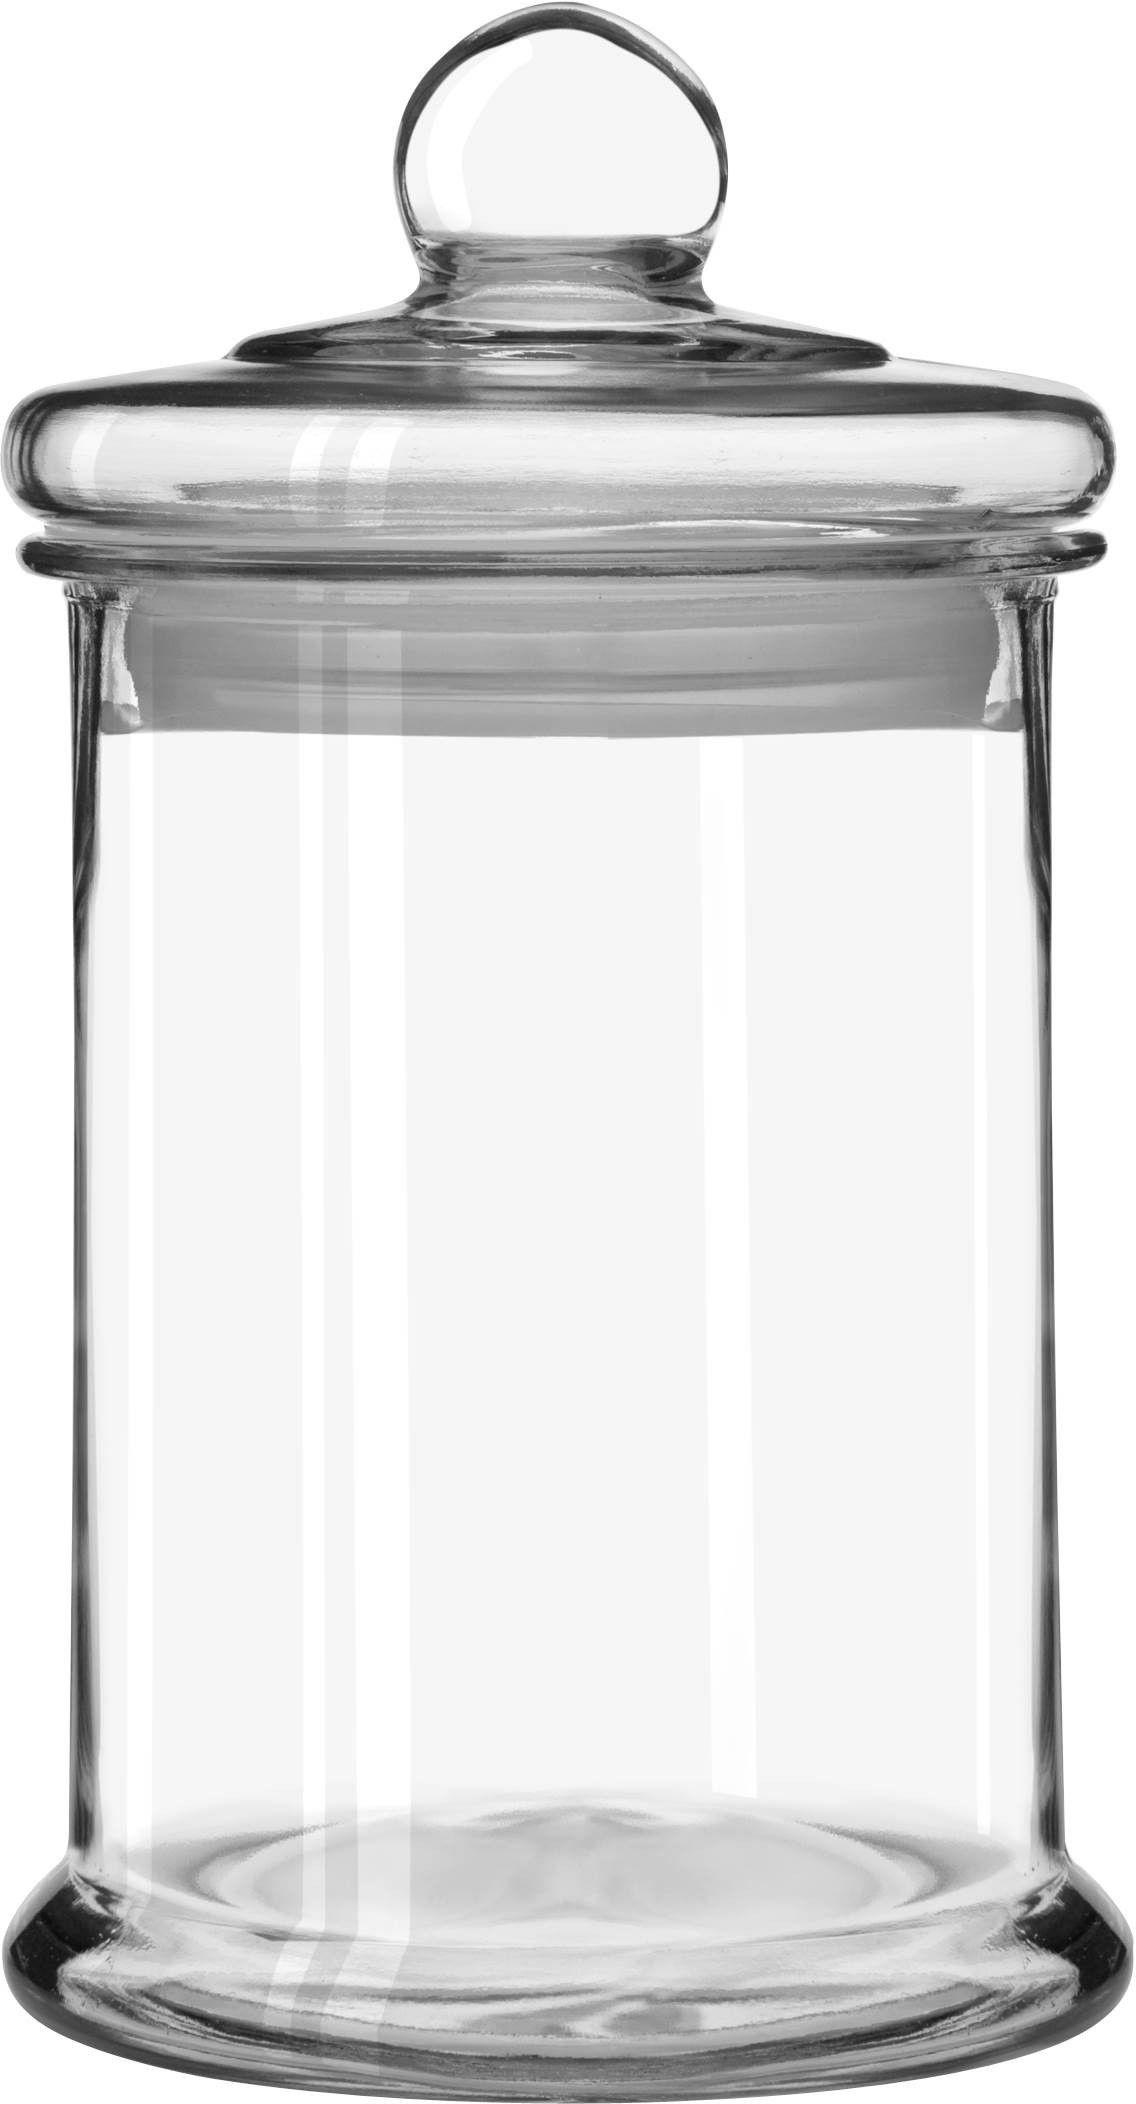 Słoik na ciastka Bell Jar 4,7 litra Libbey LB-55230-2